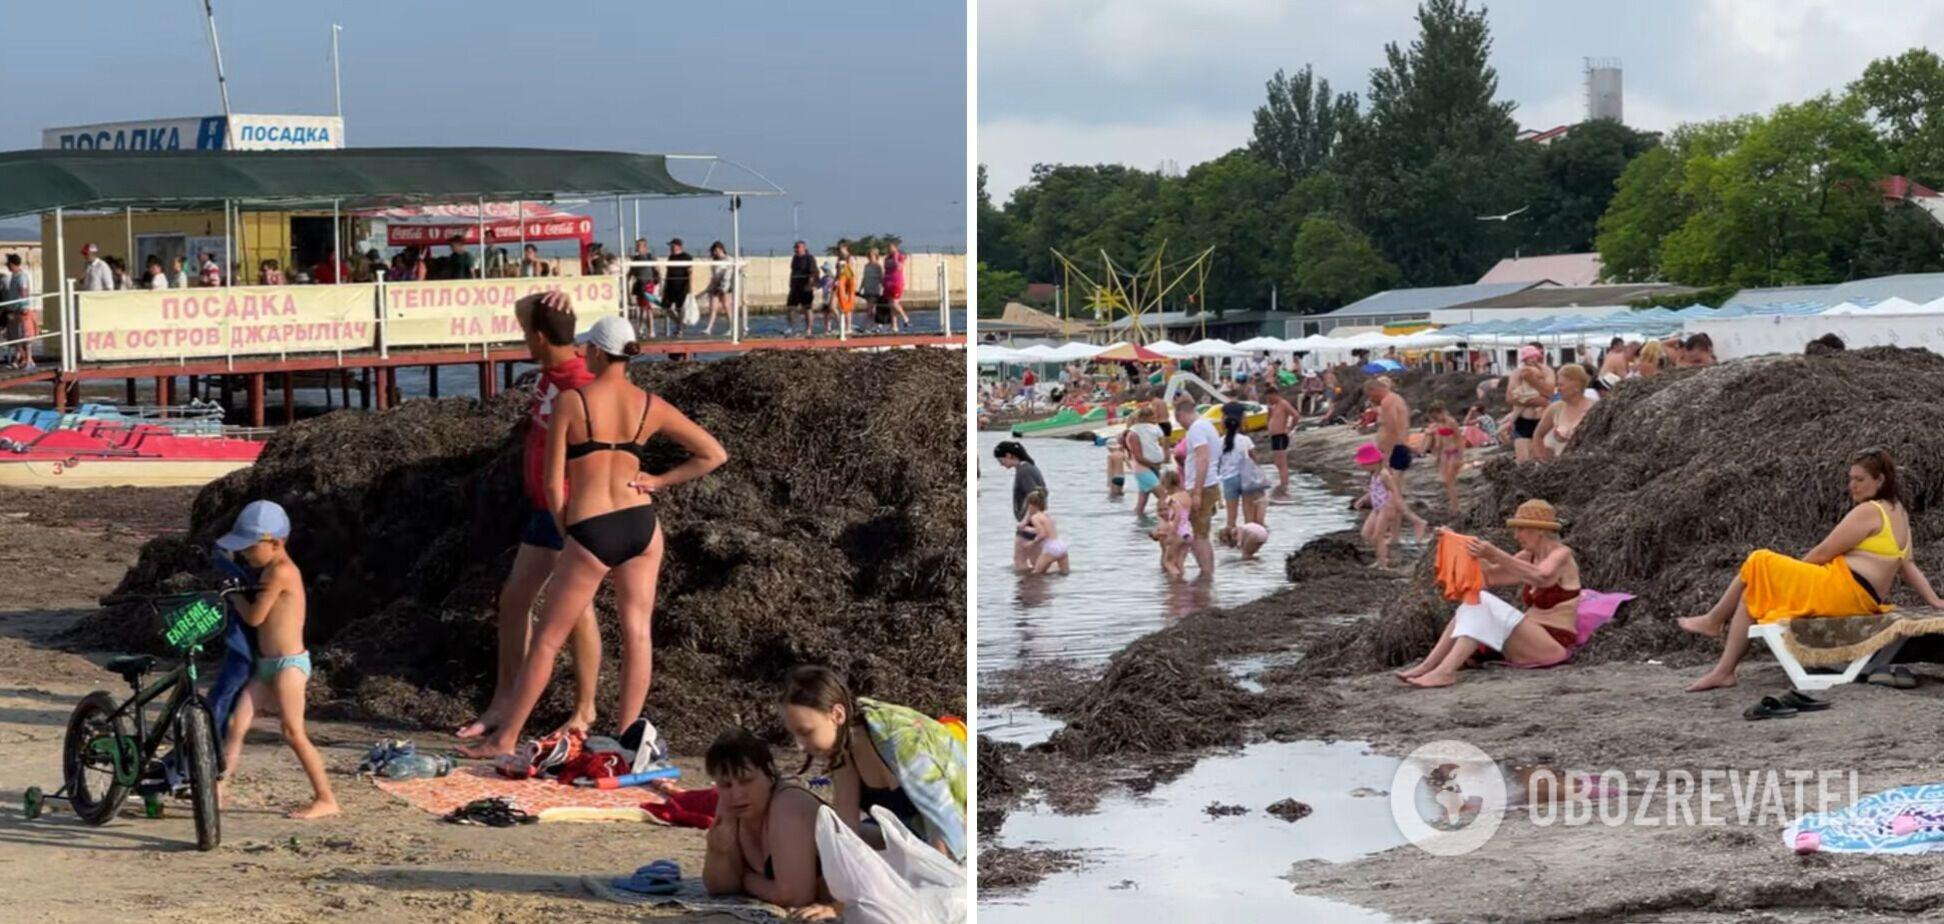 Медуз и морских блох нет, но запах как на ферме: турист назвал главный минус отдыха в Скадовске